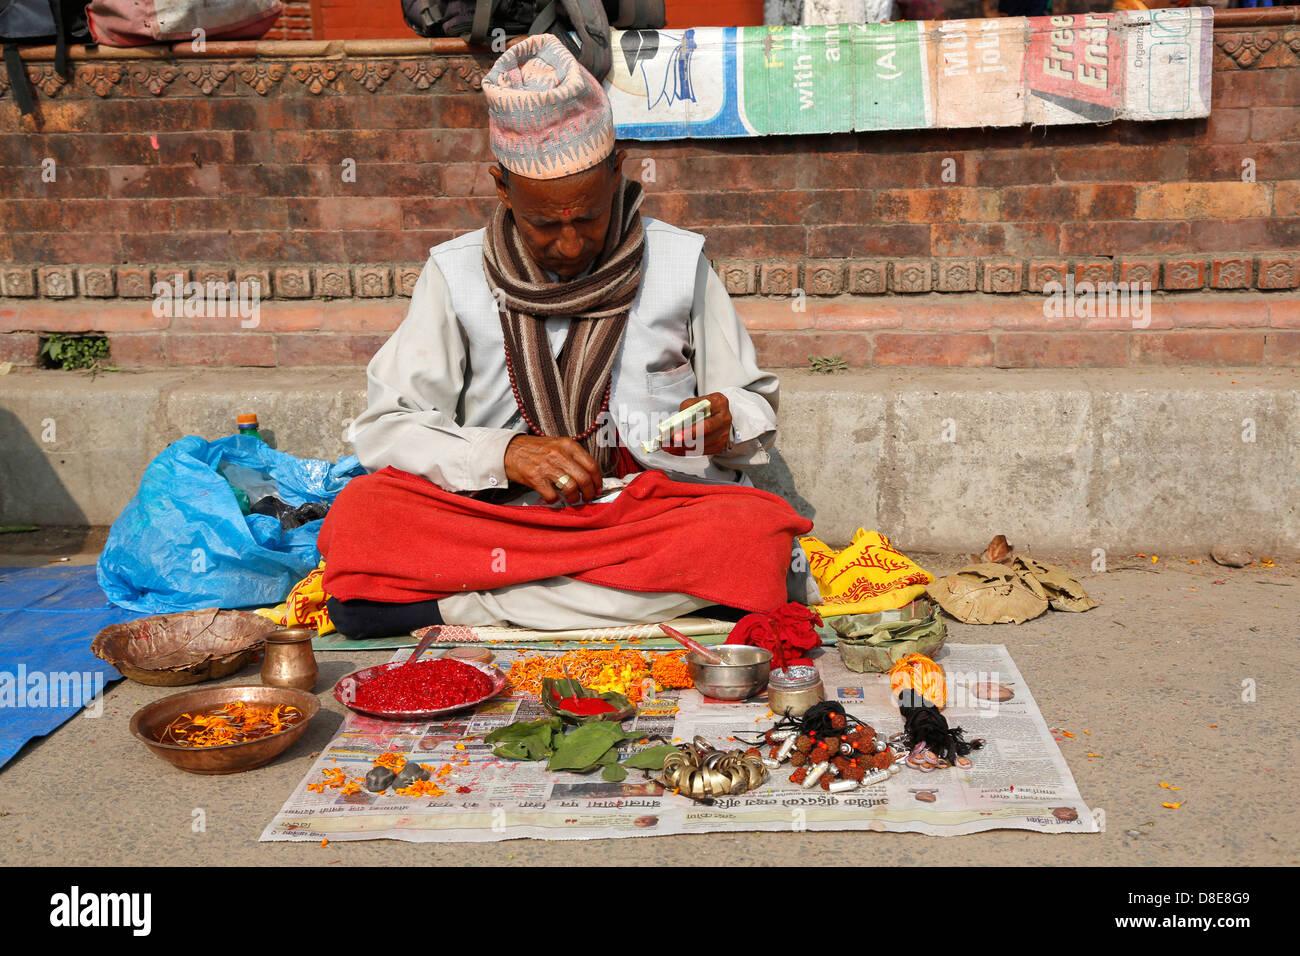 Sadhu in front of Pahupatinath Temple, Kathmandu, Nepal, Asia - Stock Image